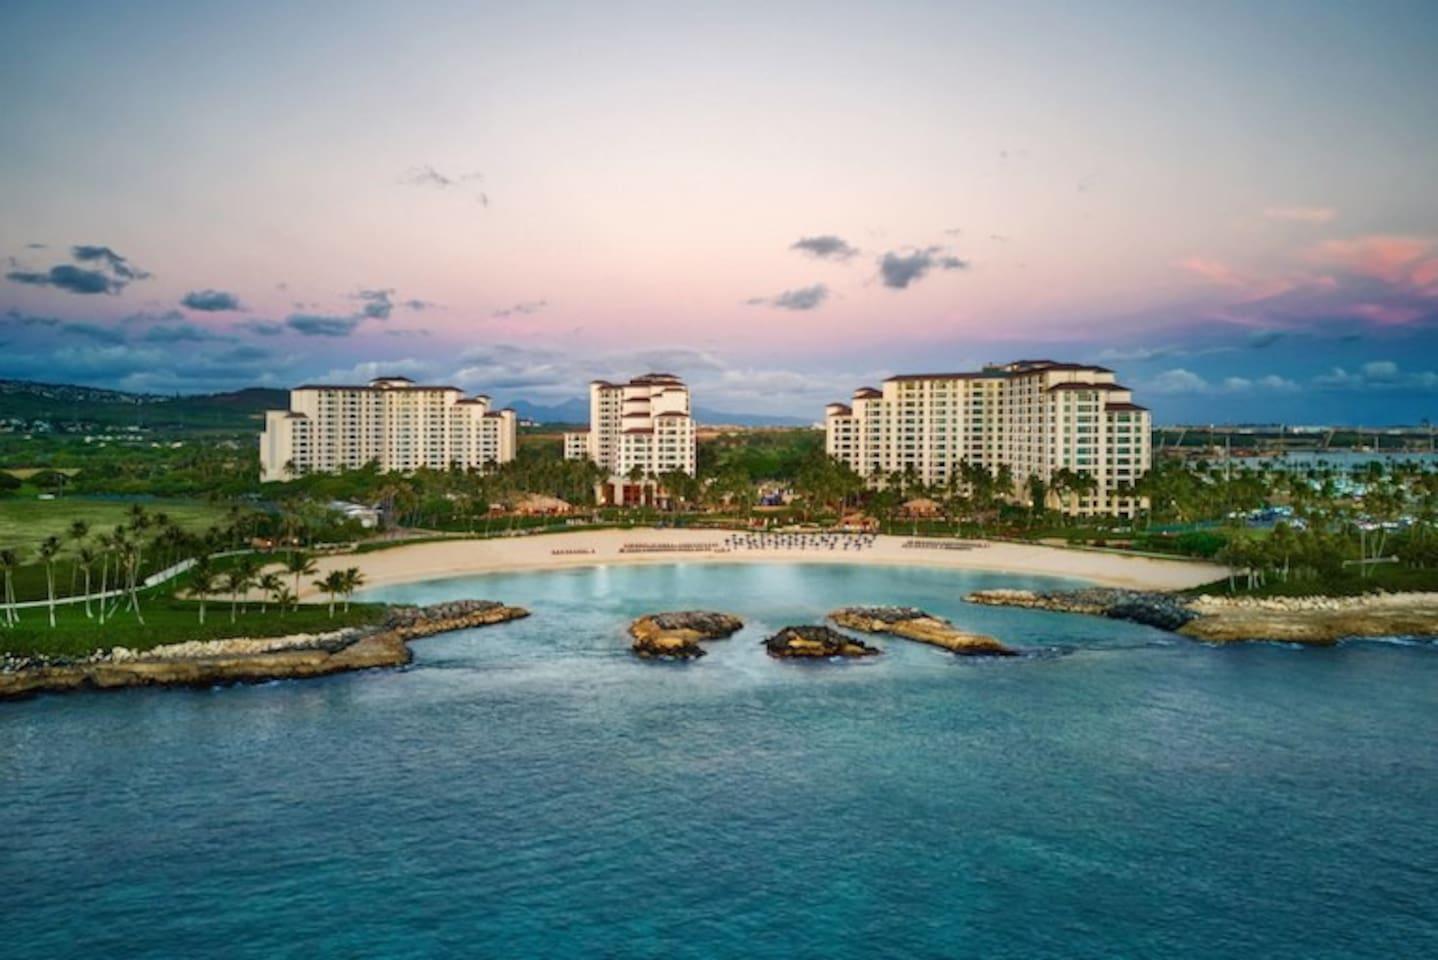 Marriott Ko Olina Beach Club view from ocean